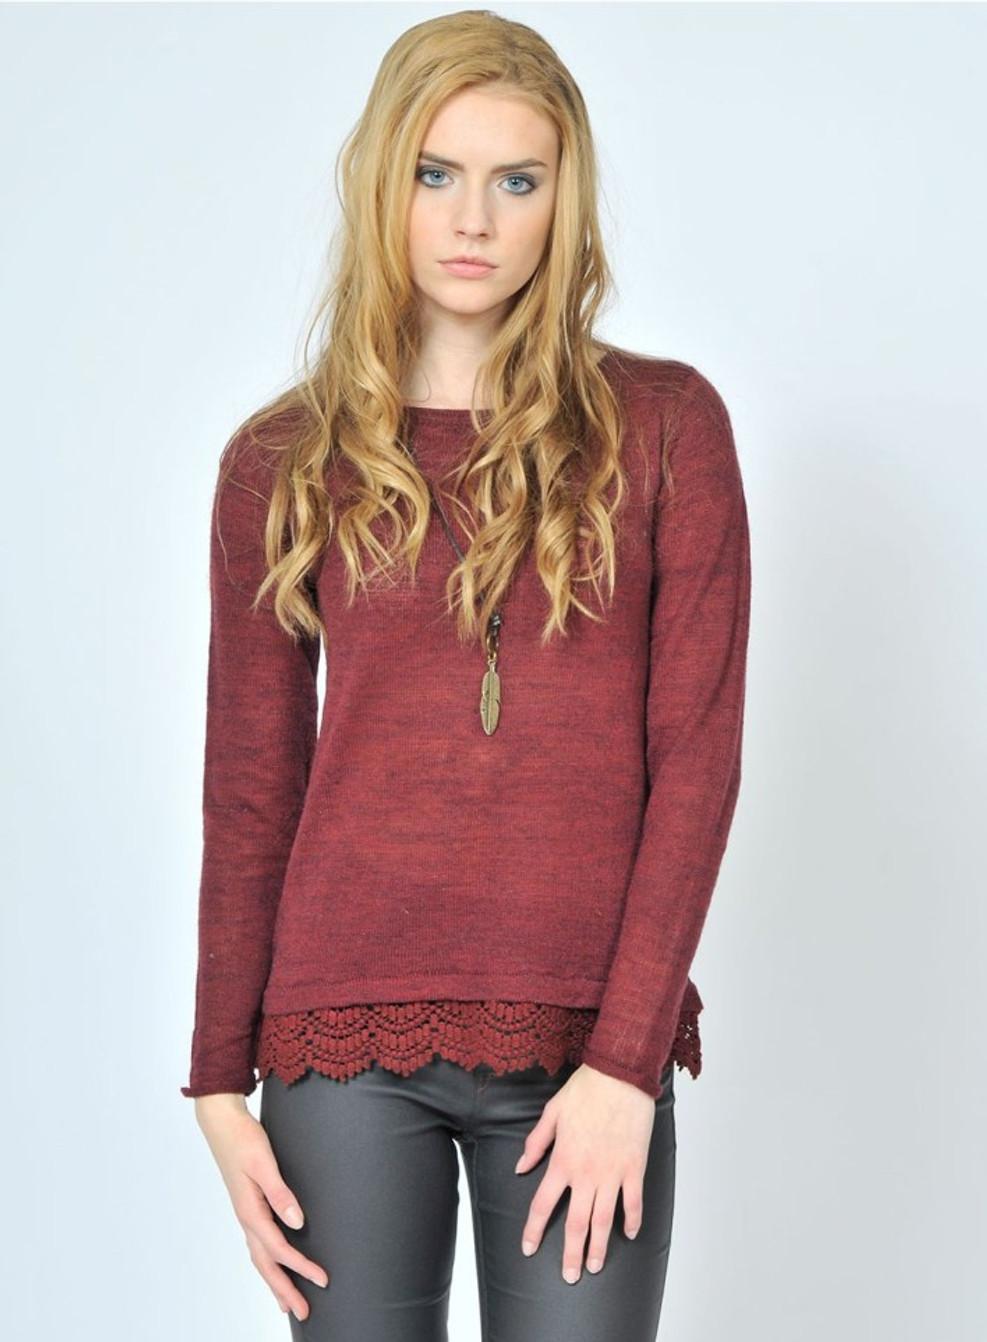 woodstock-burgundy sweater pink maritni